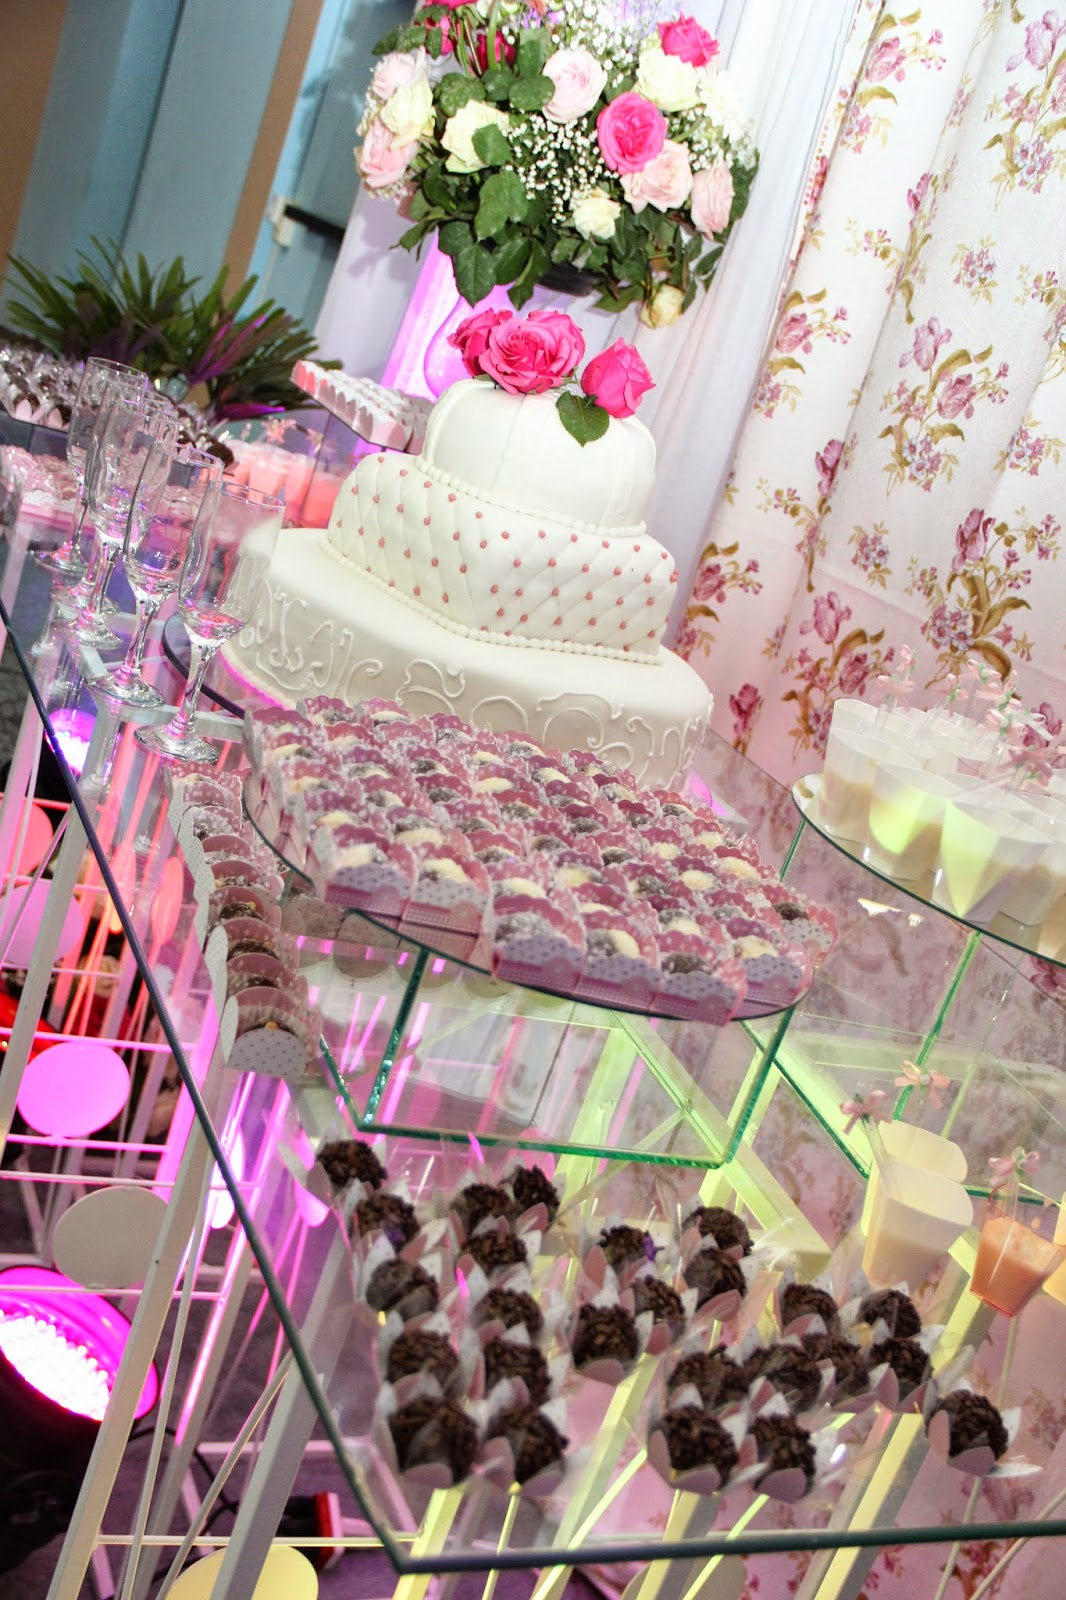 fotografo para casamento joinville joinville decoracoes -> Decoração De Eventos Florianopolis